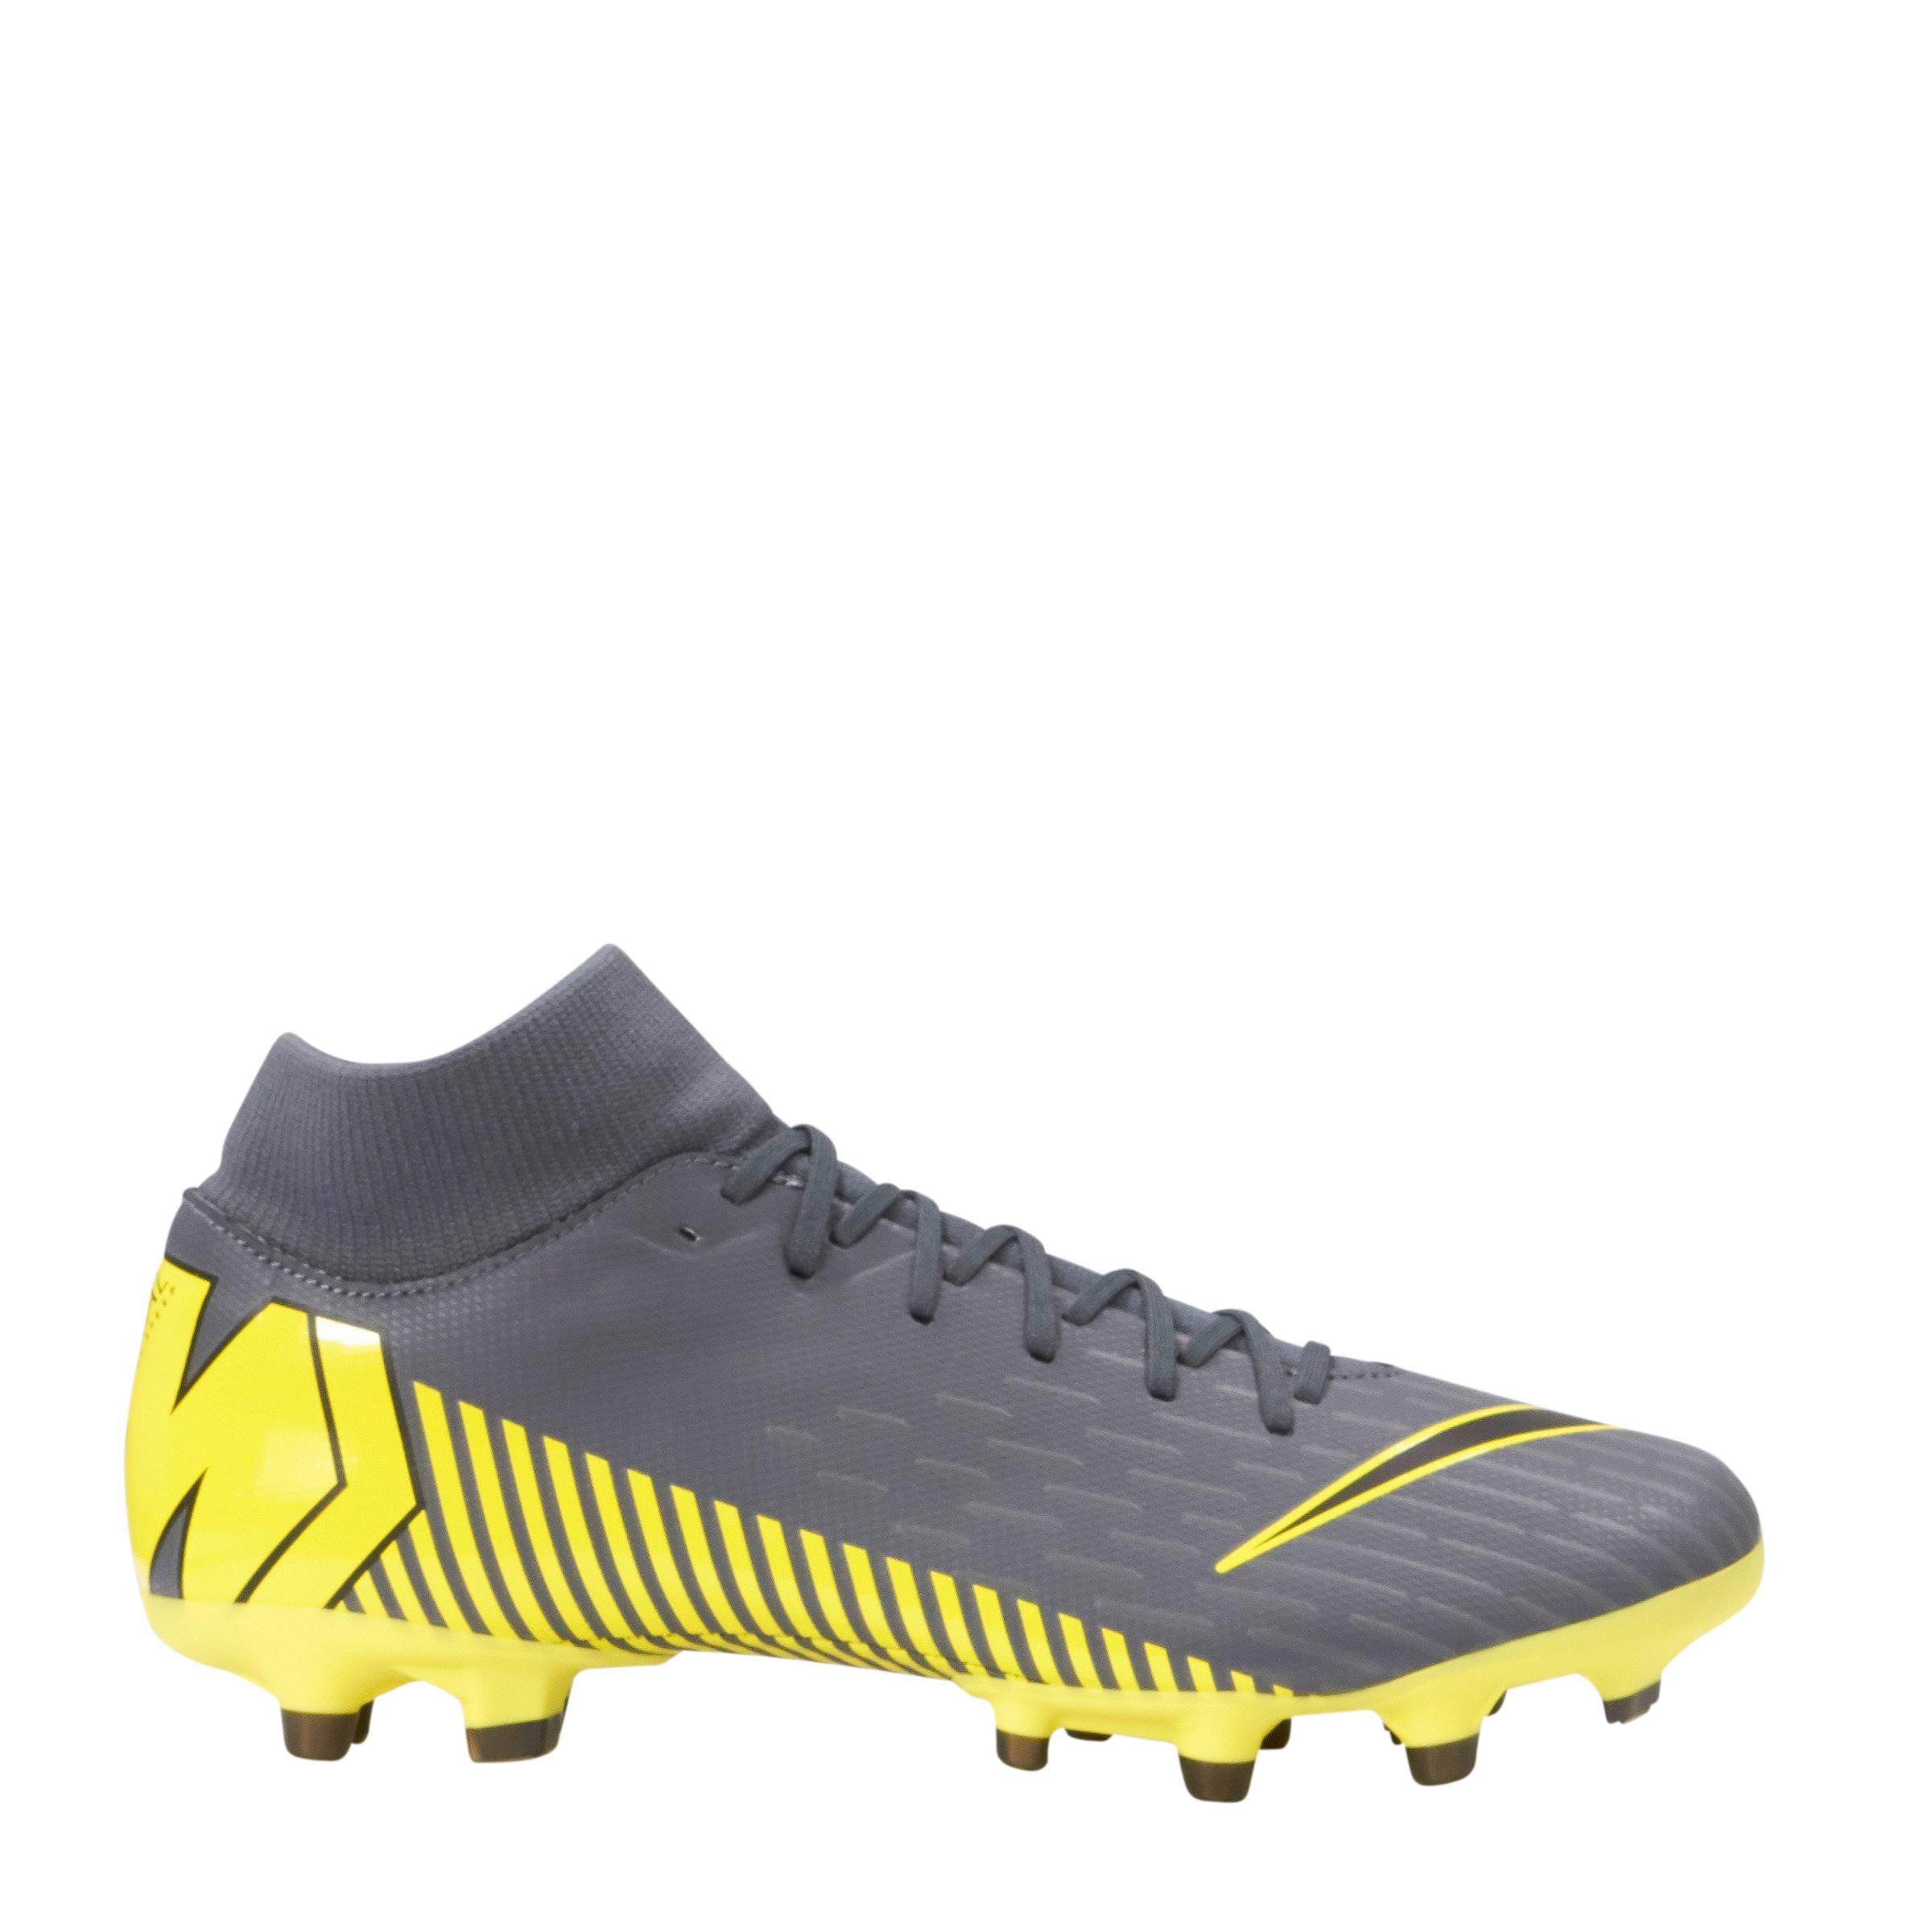 newest 18ba2 1accb Nike Mercurial Superfly 6 Academy FGMG voetbalschoenen  wehk